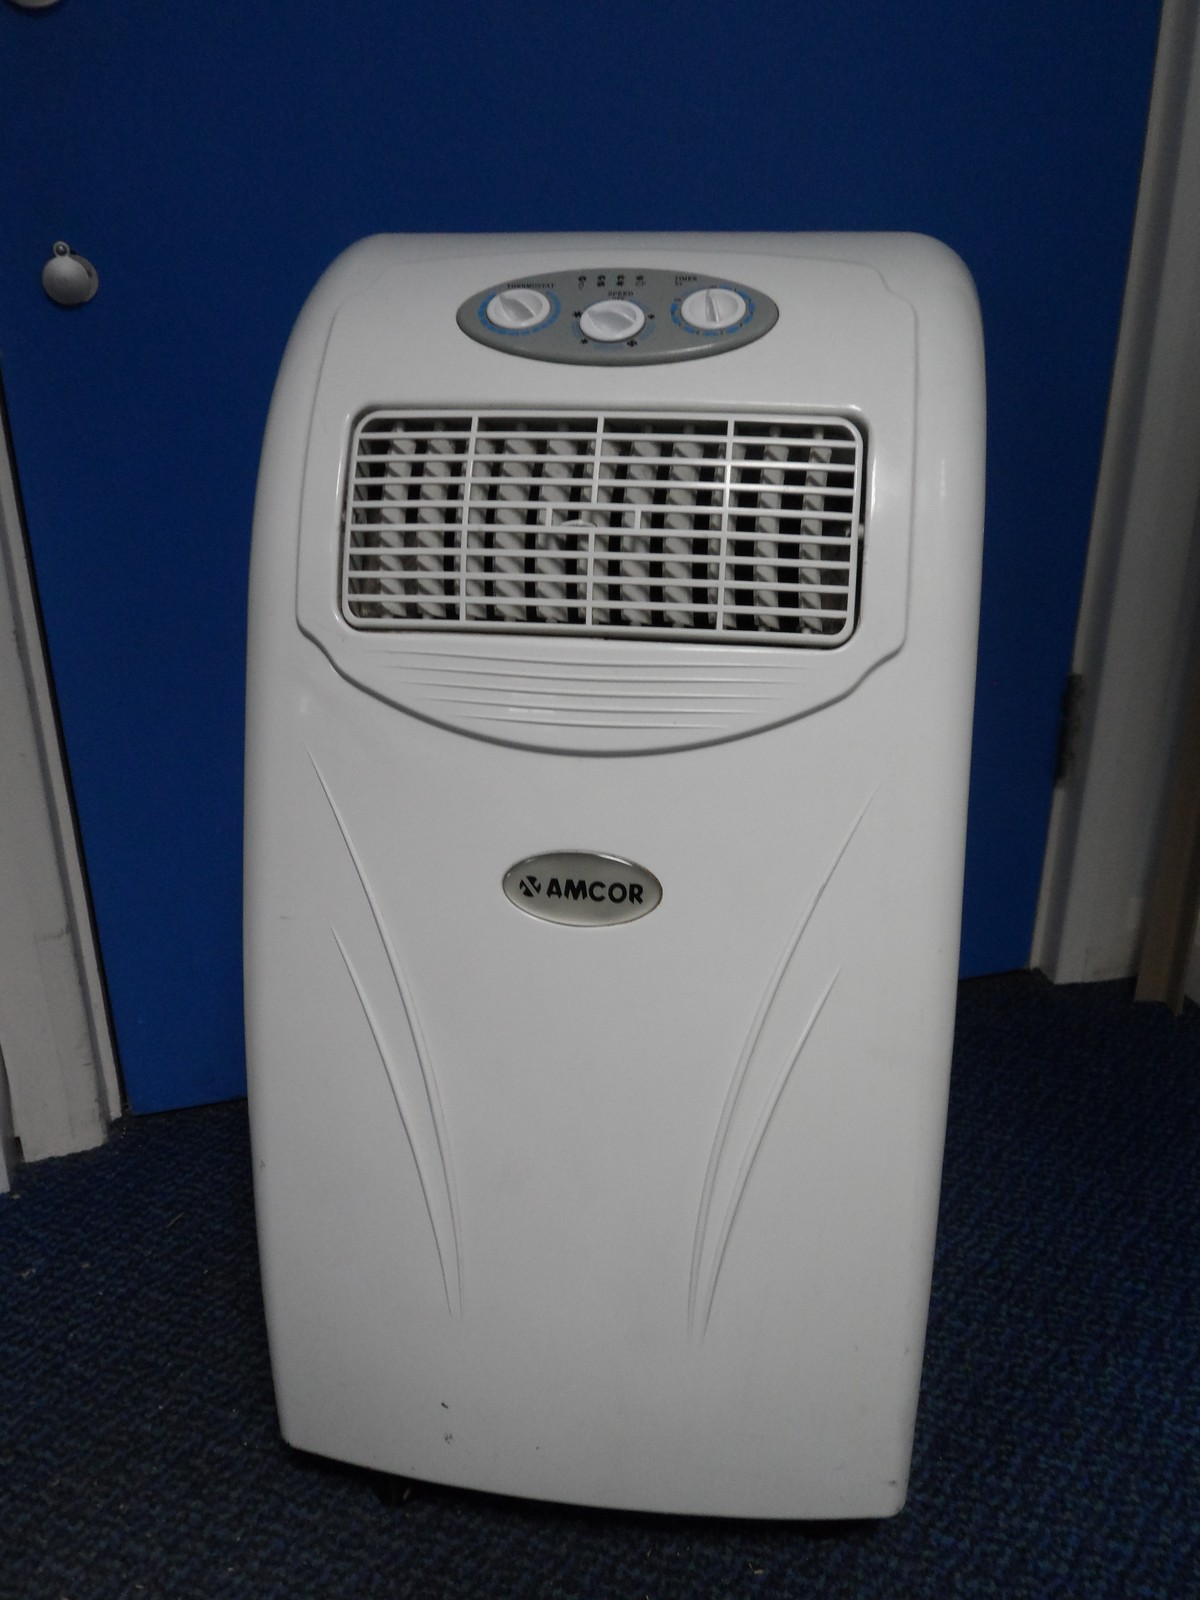 Amcor Portable Air Conditioner Kf9000e Wiring Diagram